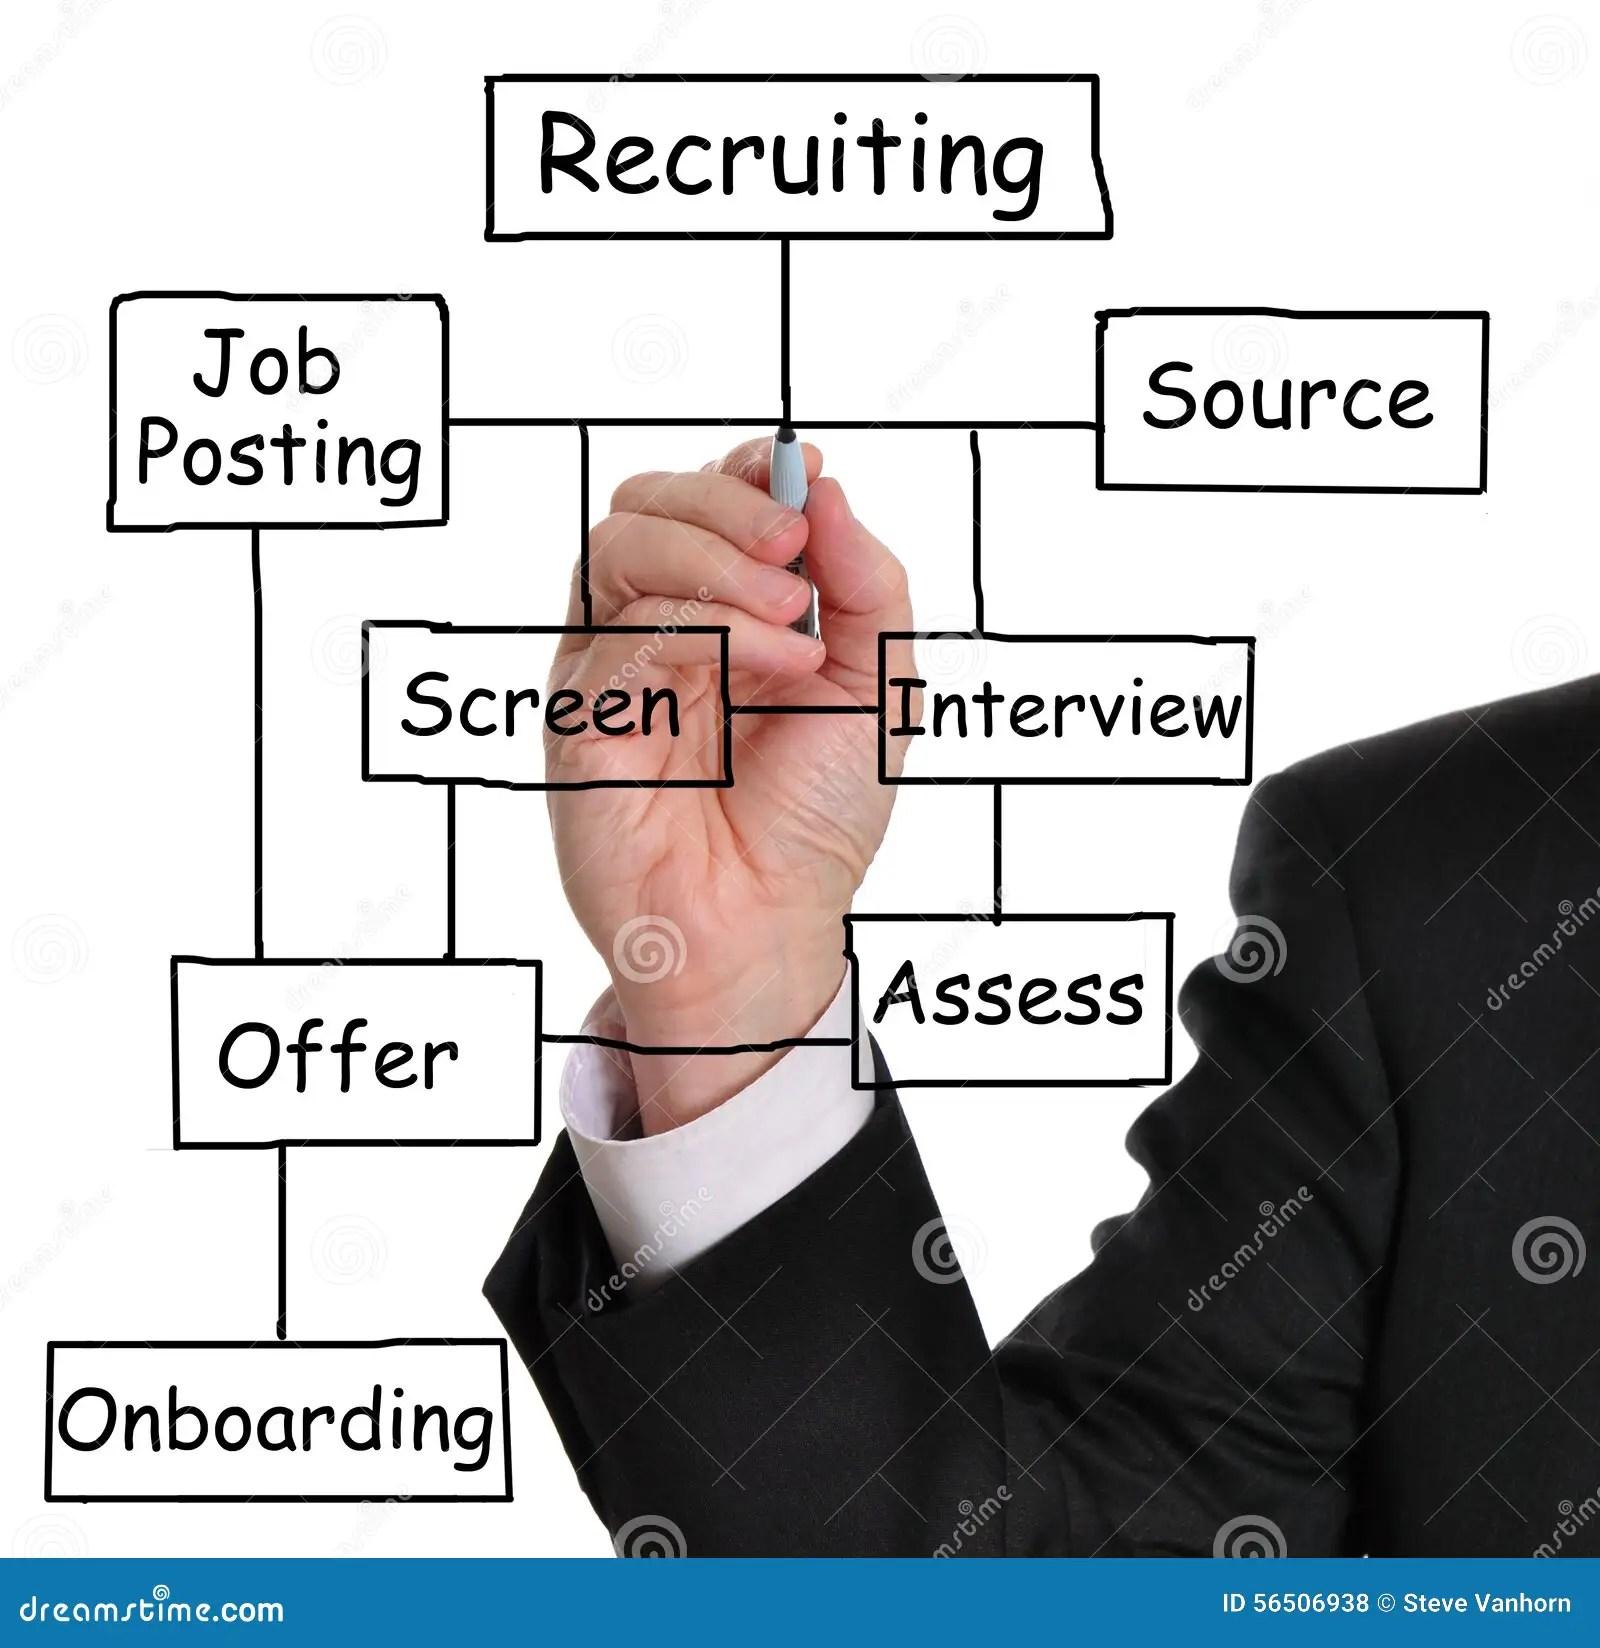 diagram process recruiting 2001 isuzu rodeo engine recruitment stock photo image of chart recruit